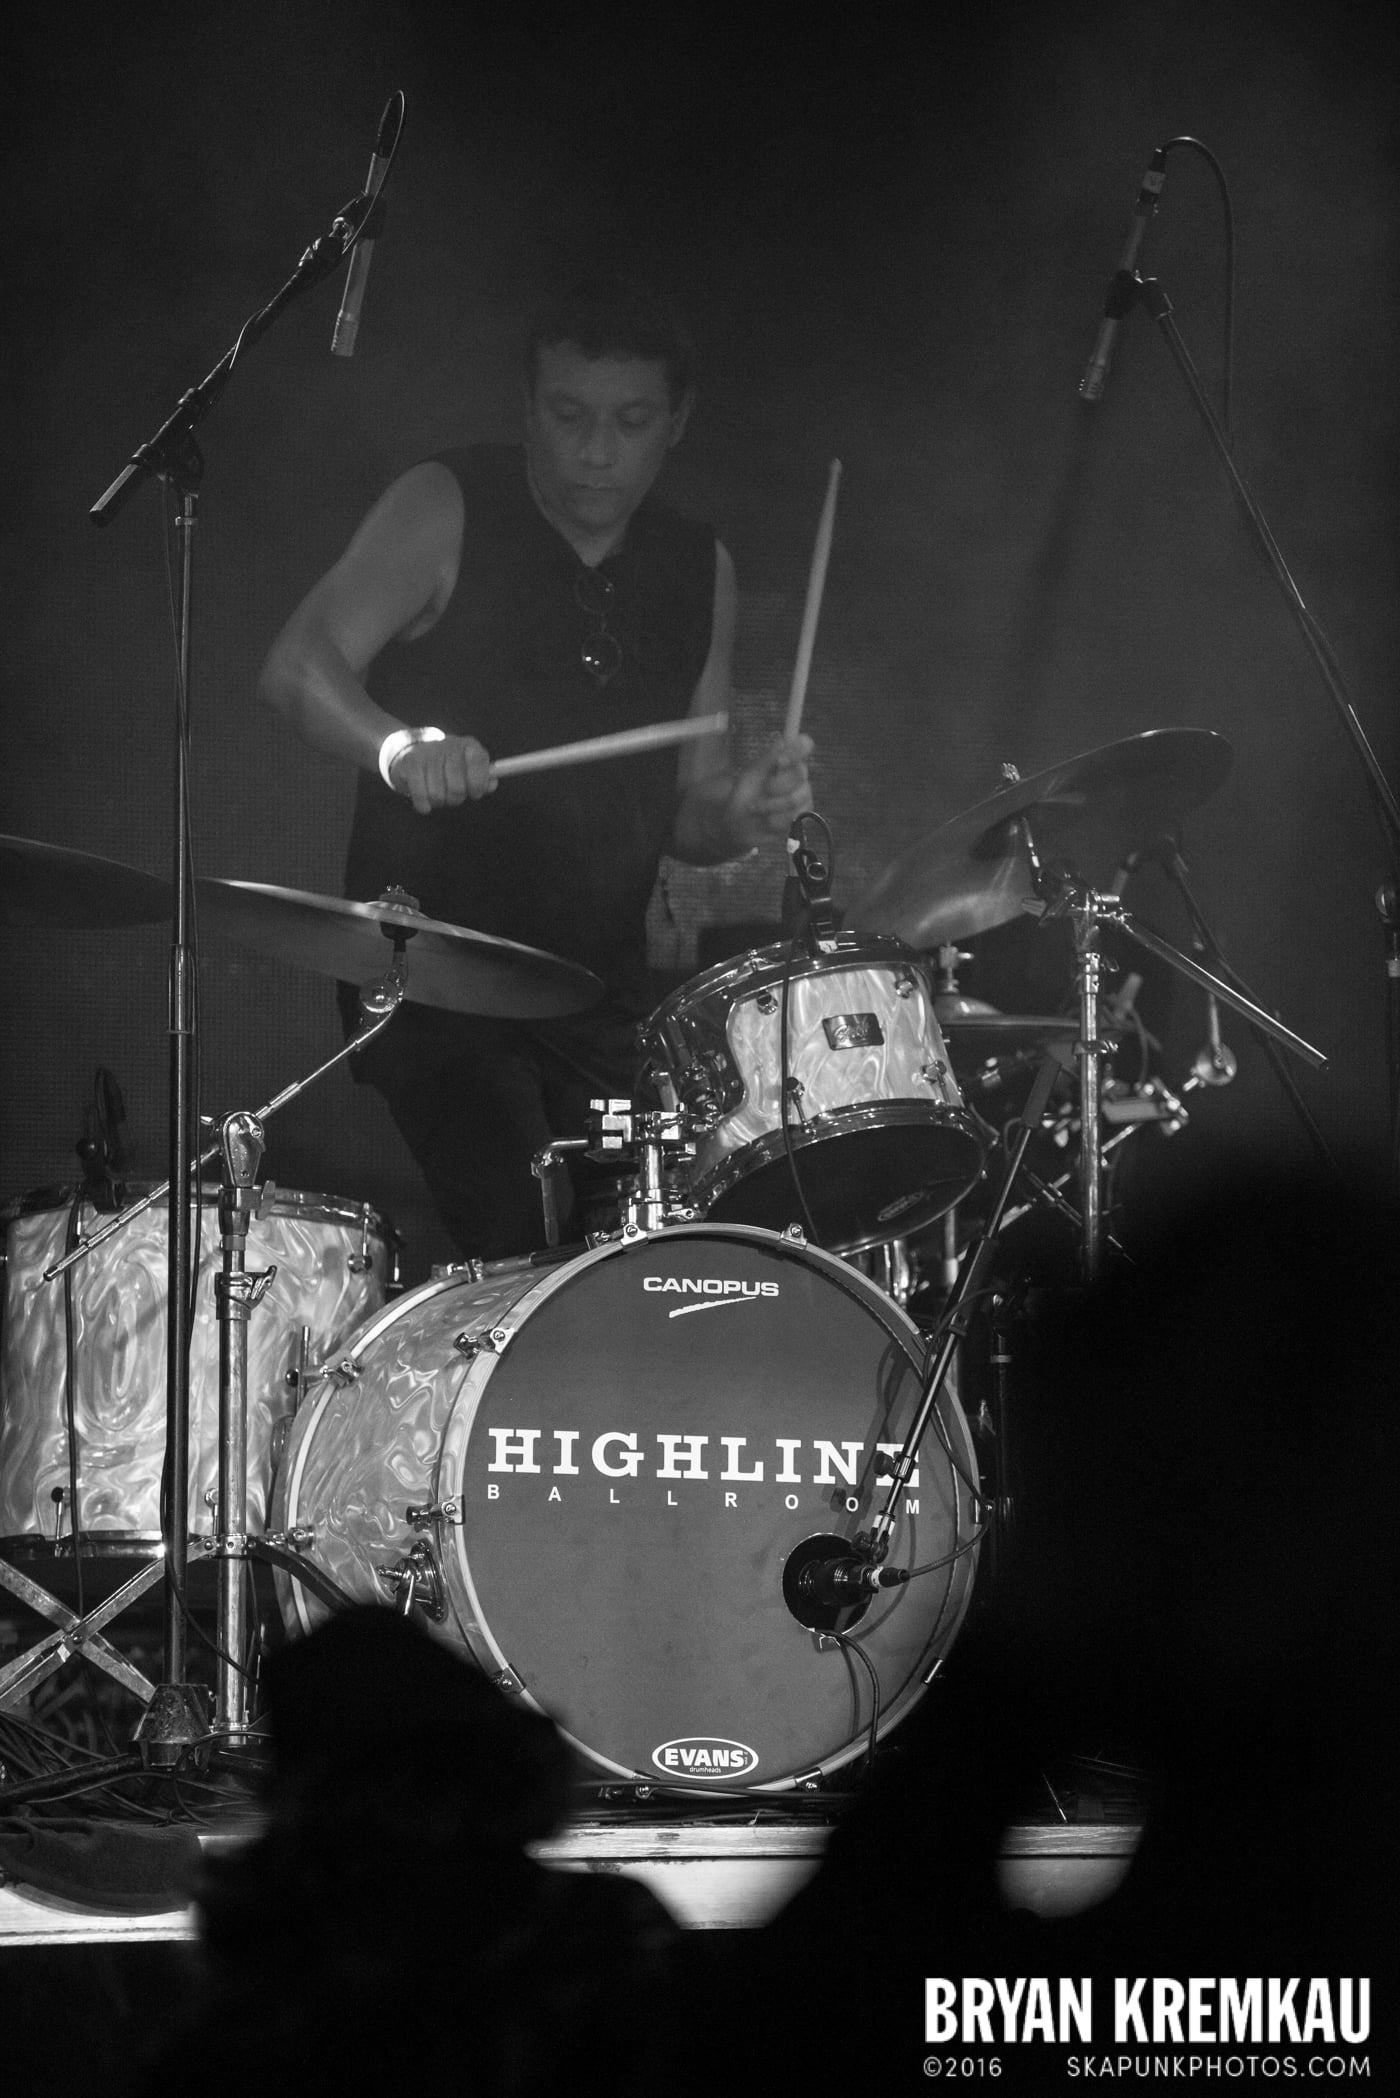 Willie Nile @ Highline Ballroom, NYC - 12.26.14 (1)